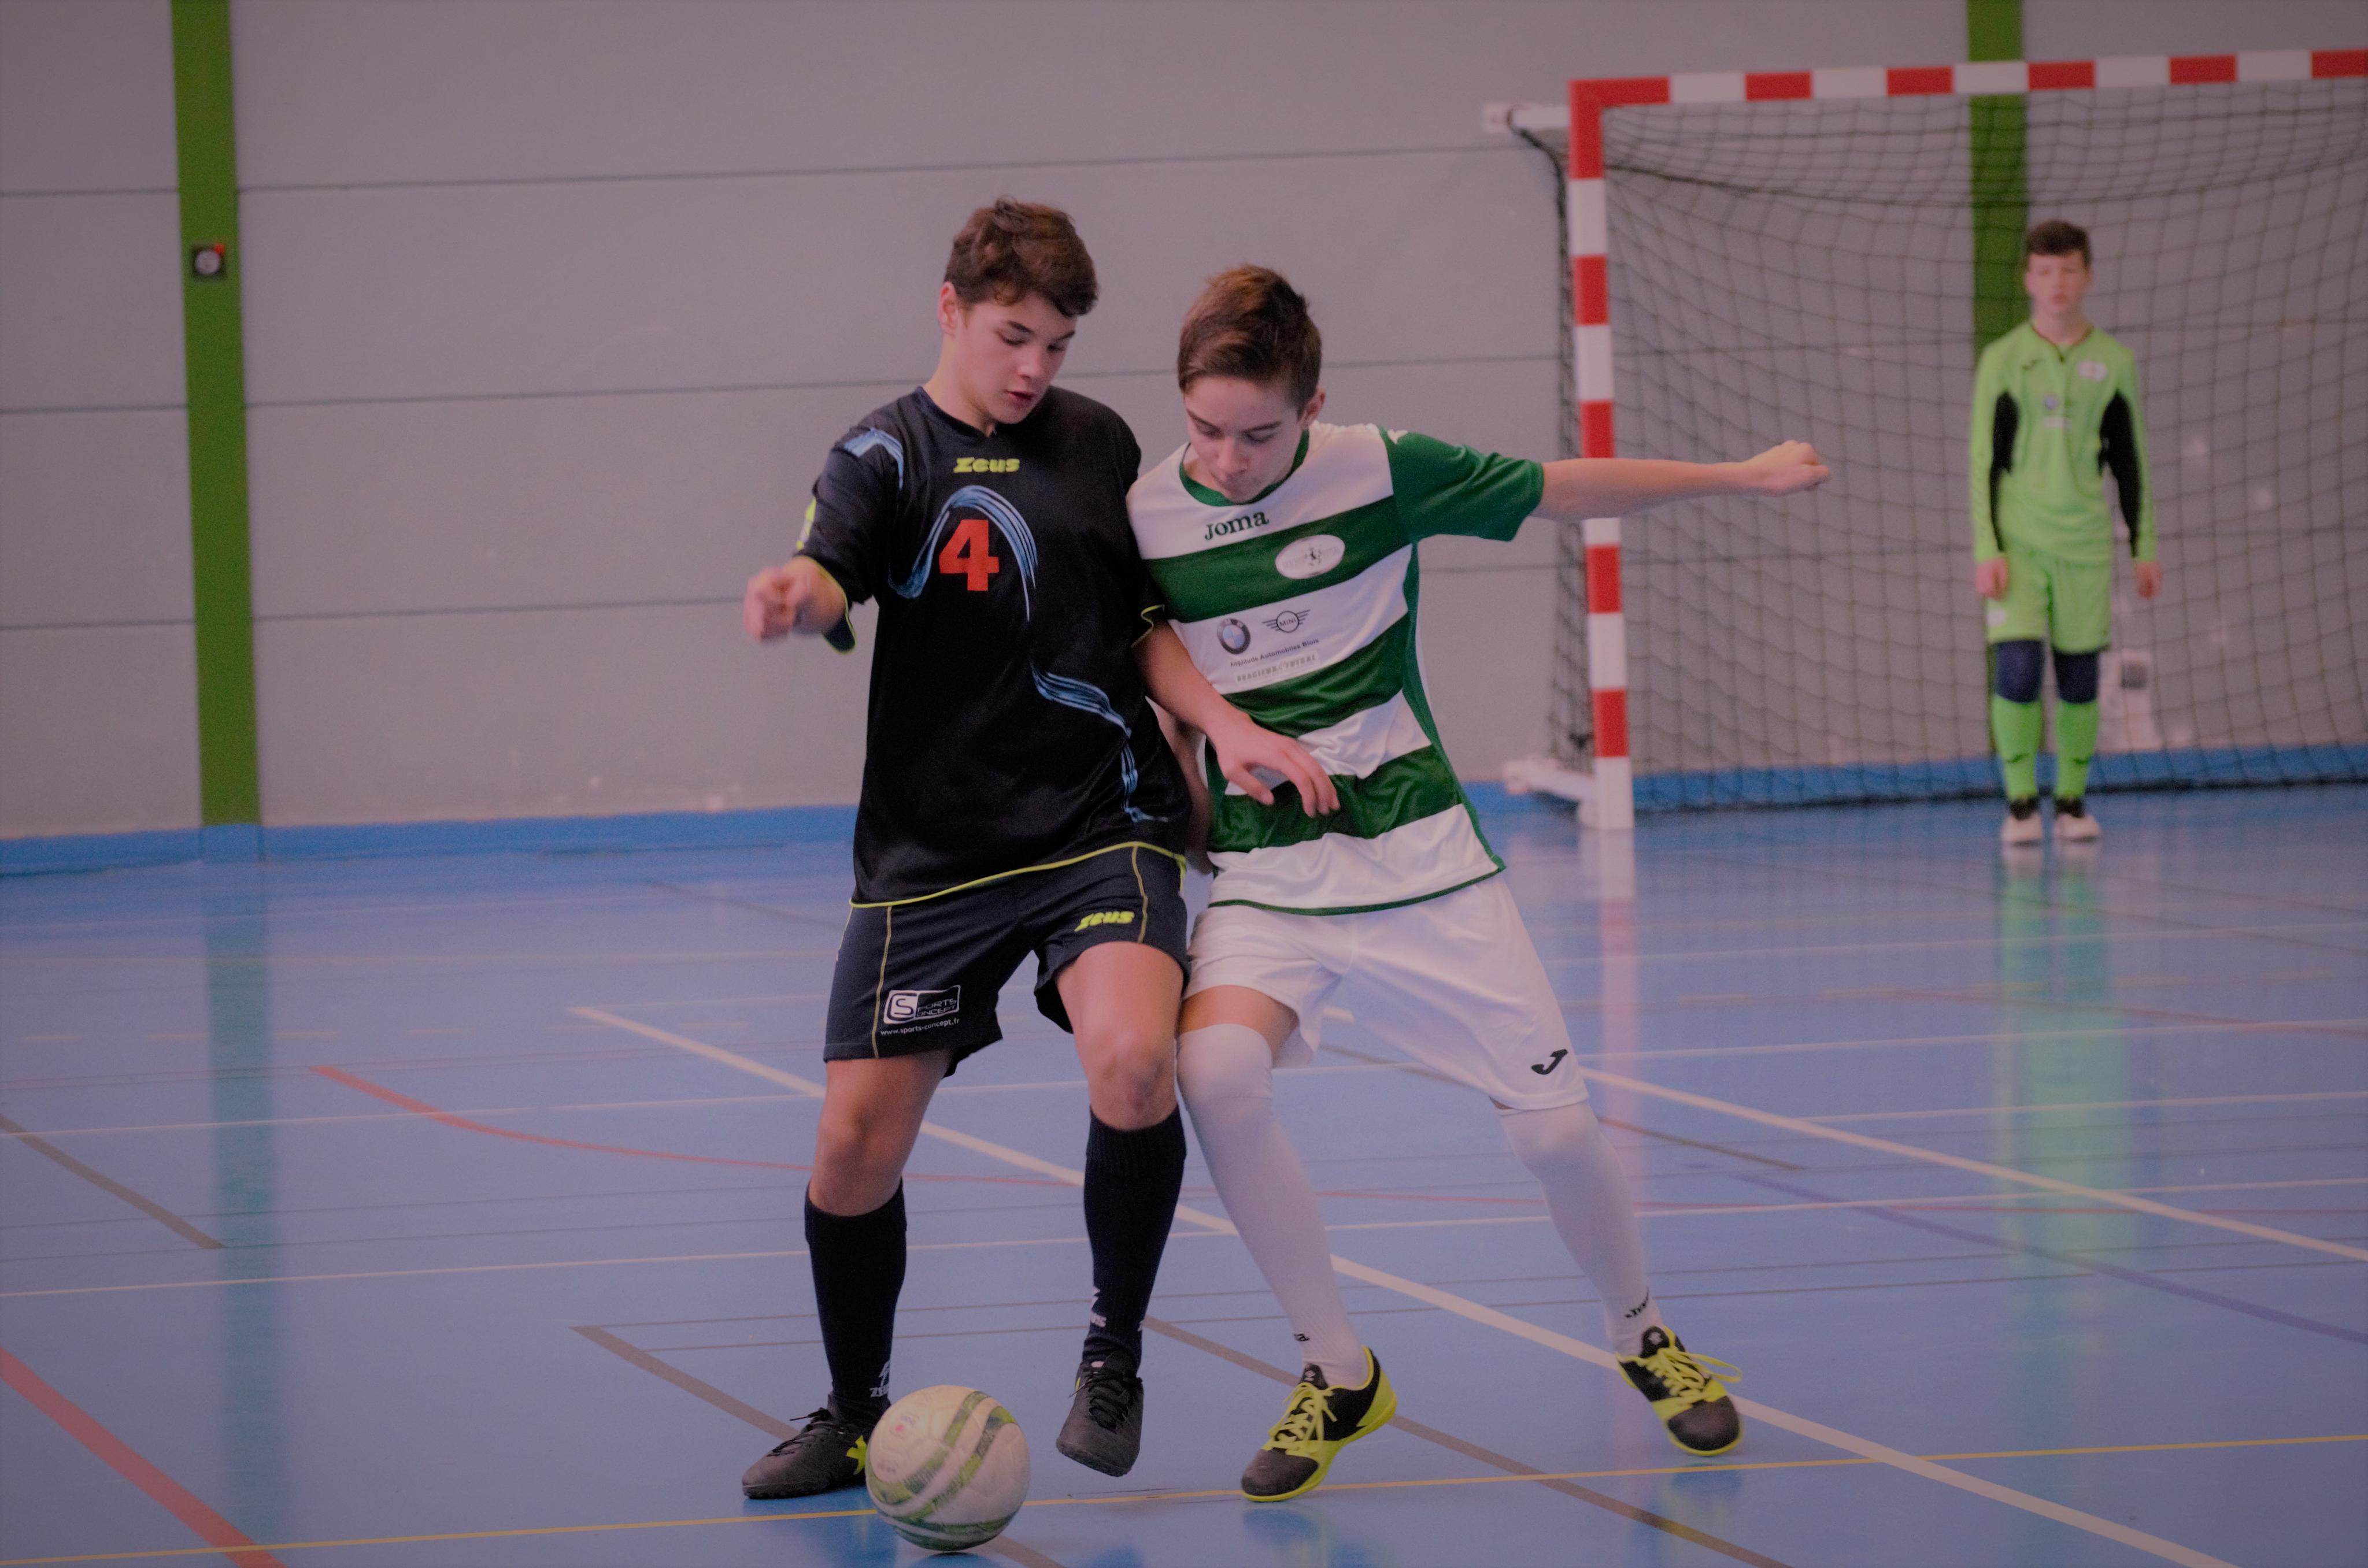 résultats academie futsal france aff (1)